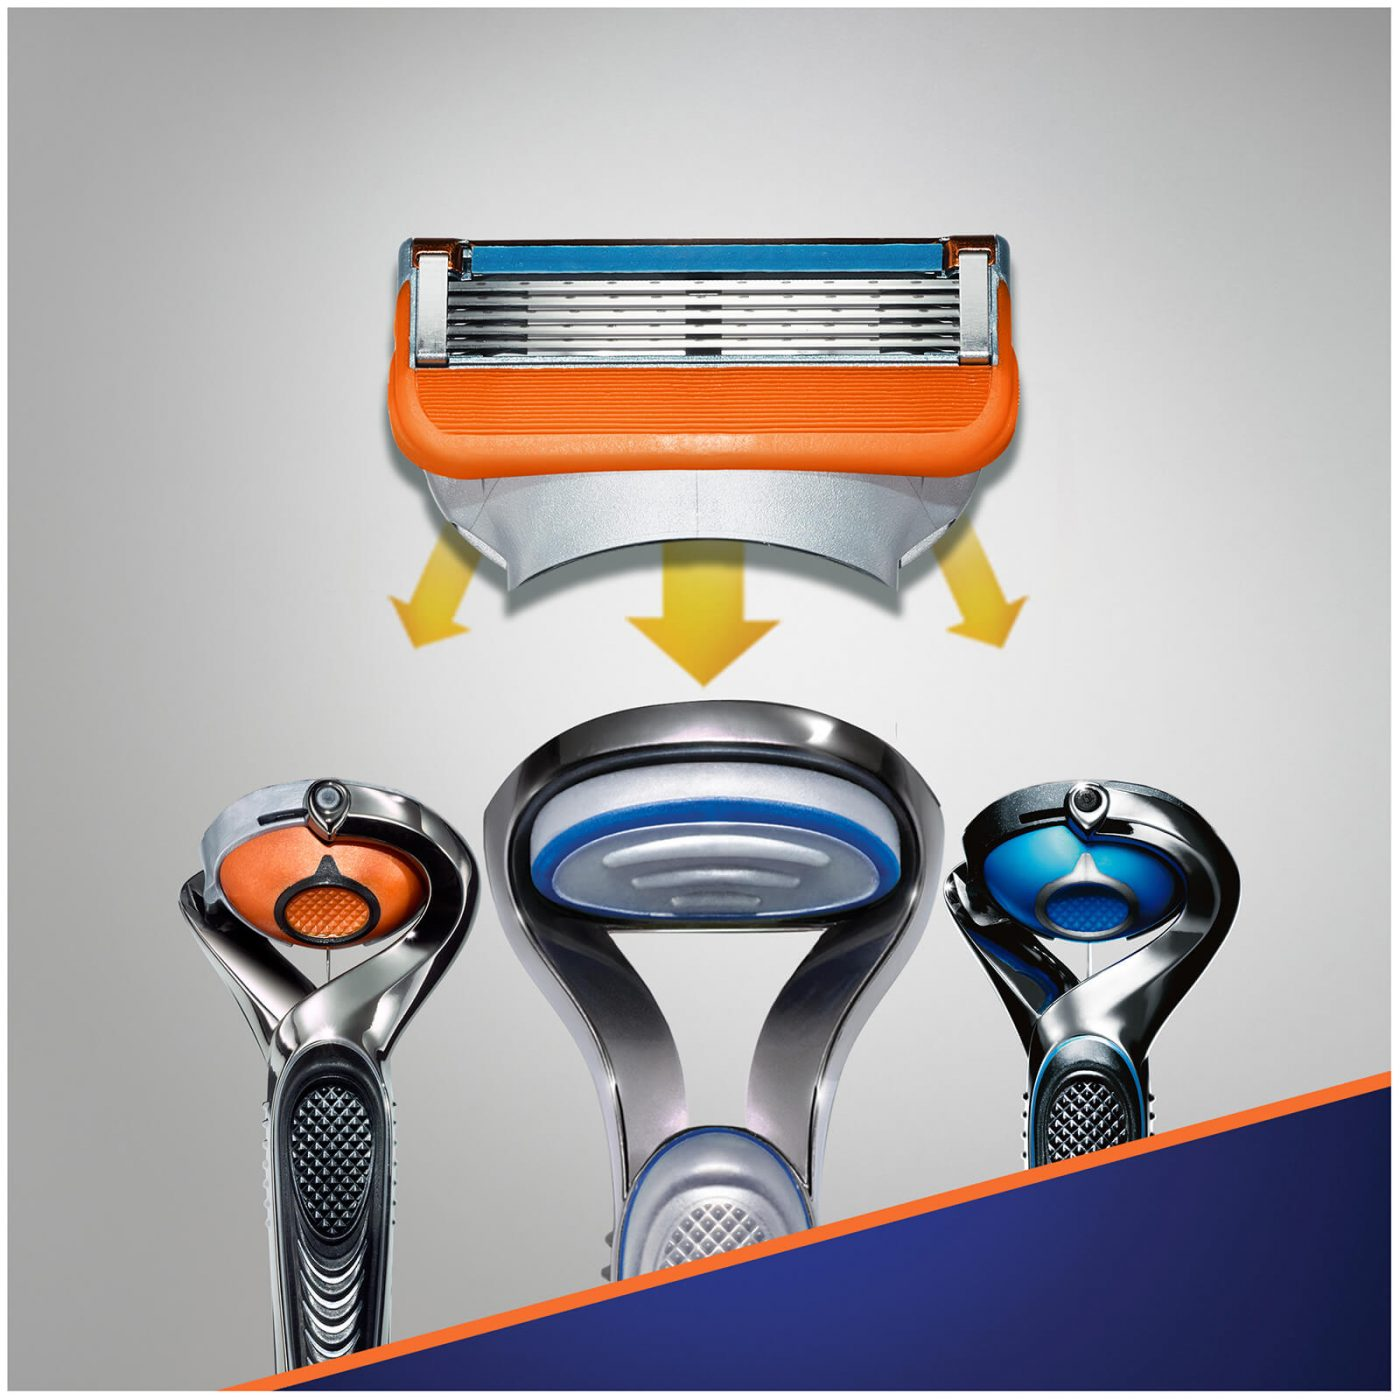 Gillette Fusion Mens Shaving Razor Blades (8 Pack Refill Cartridges)